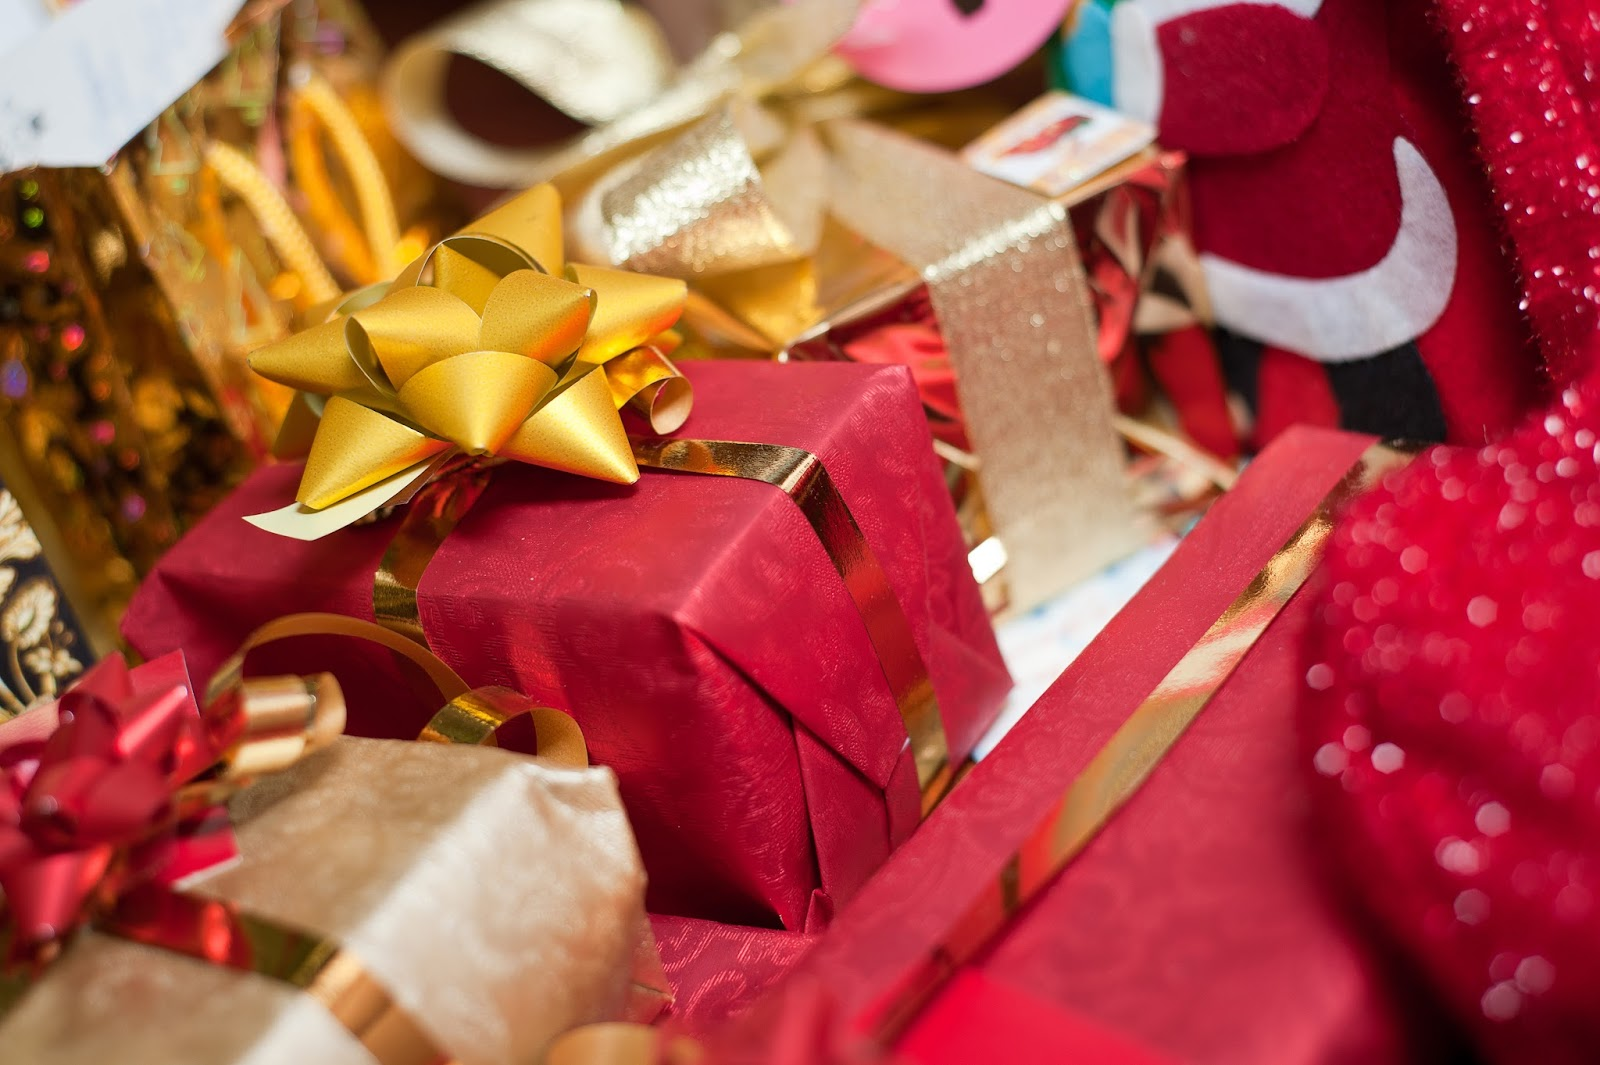 joyeux no l holiday gift guide 2015 appelez moi ana. Black Bedroom Furniture Sets. Home Design Ideas